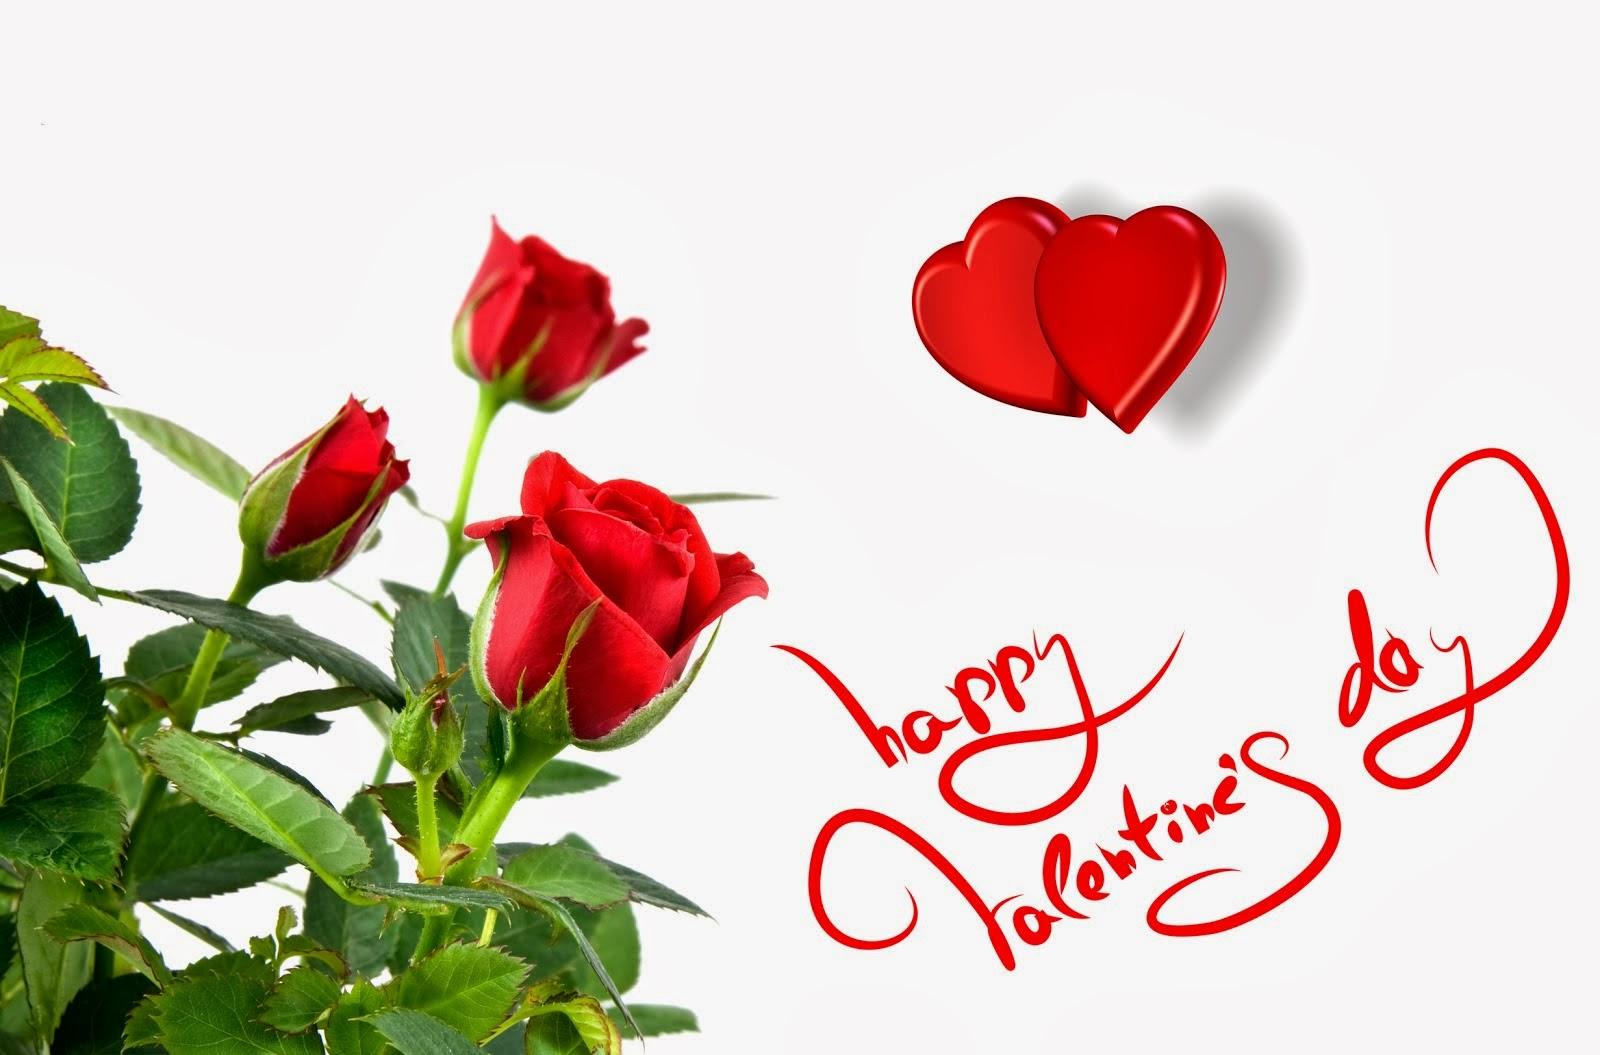 Frases Para El Dia De San Valentin En Ingles